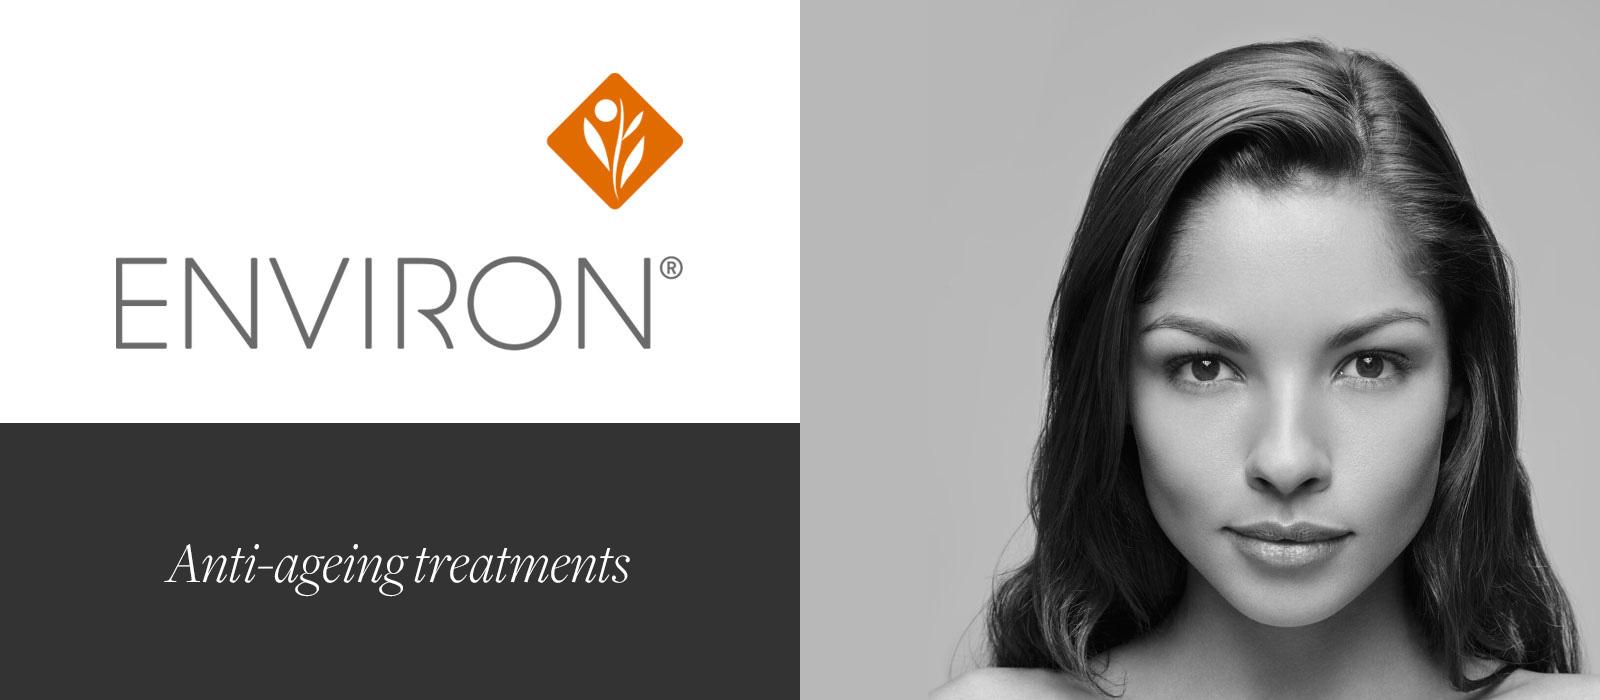 Environ Facial Treatments